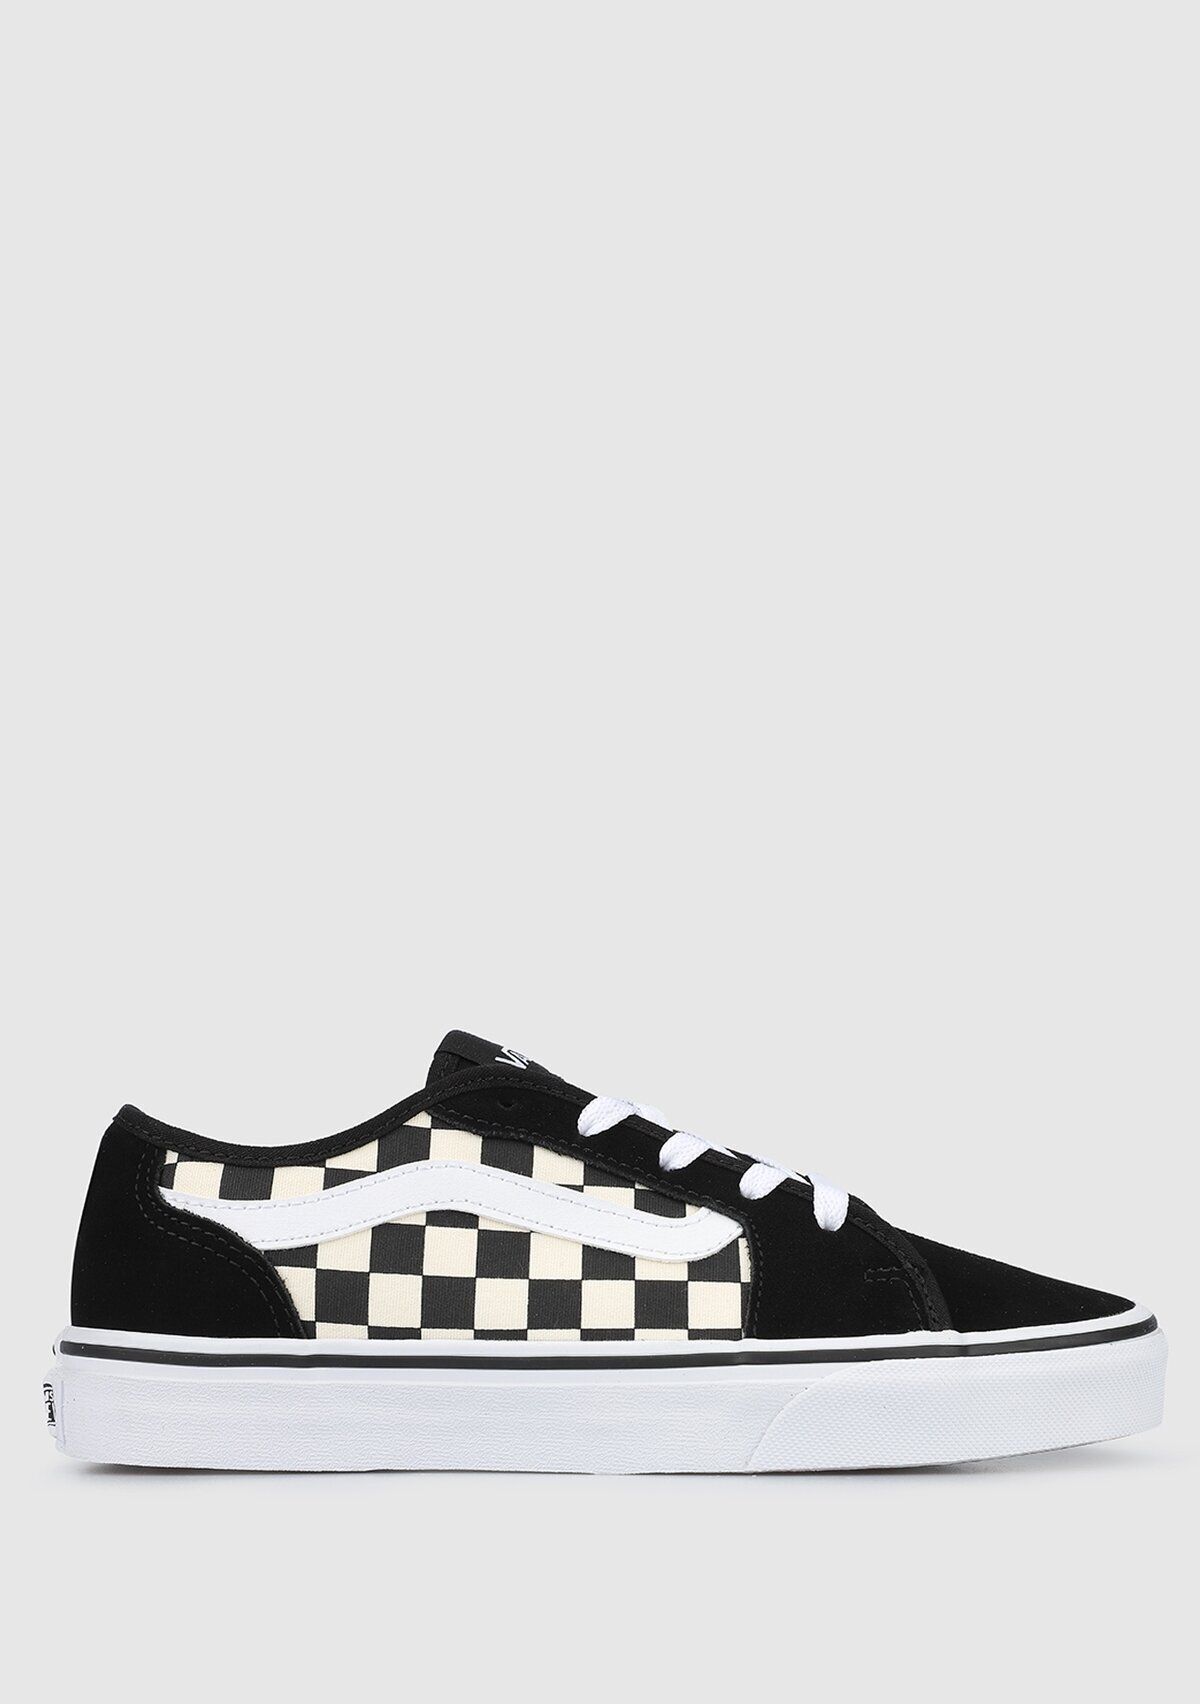 resm Checkerboard Filmore Decon Kadın Sneaker VN0A45NM5GX1